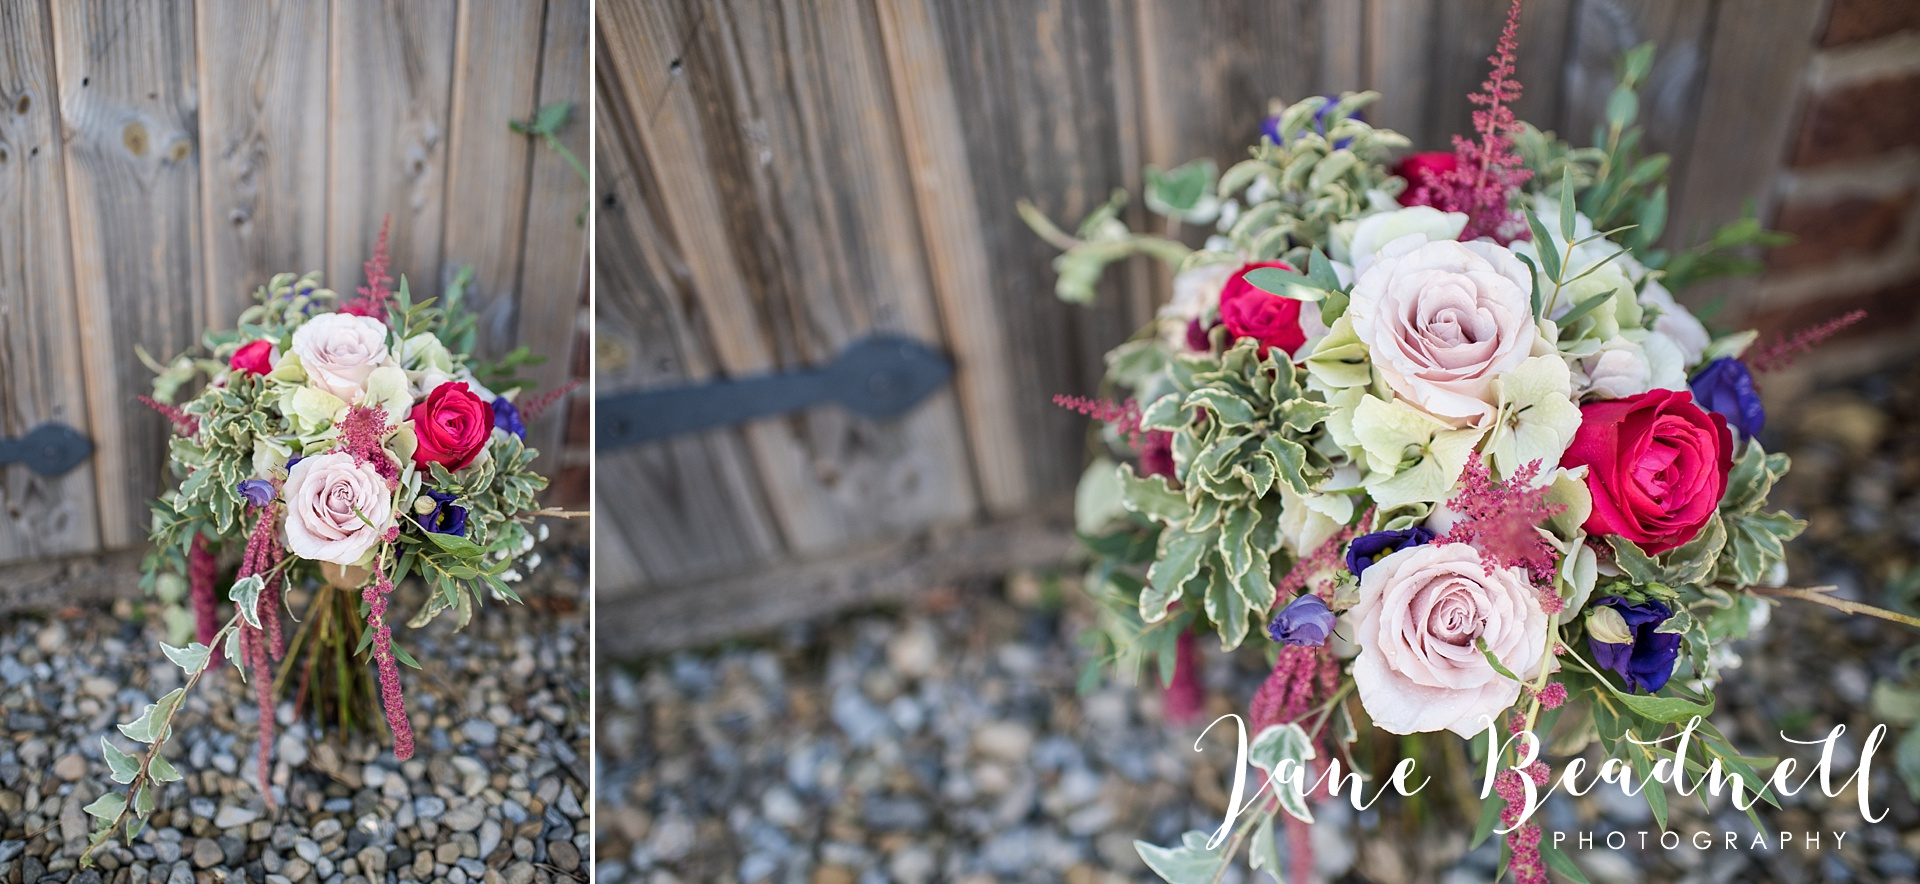 fine-art-wedding-photographer-jane-beadnell-yorkshire-wedding-photographer_0031